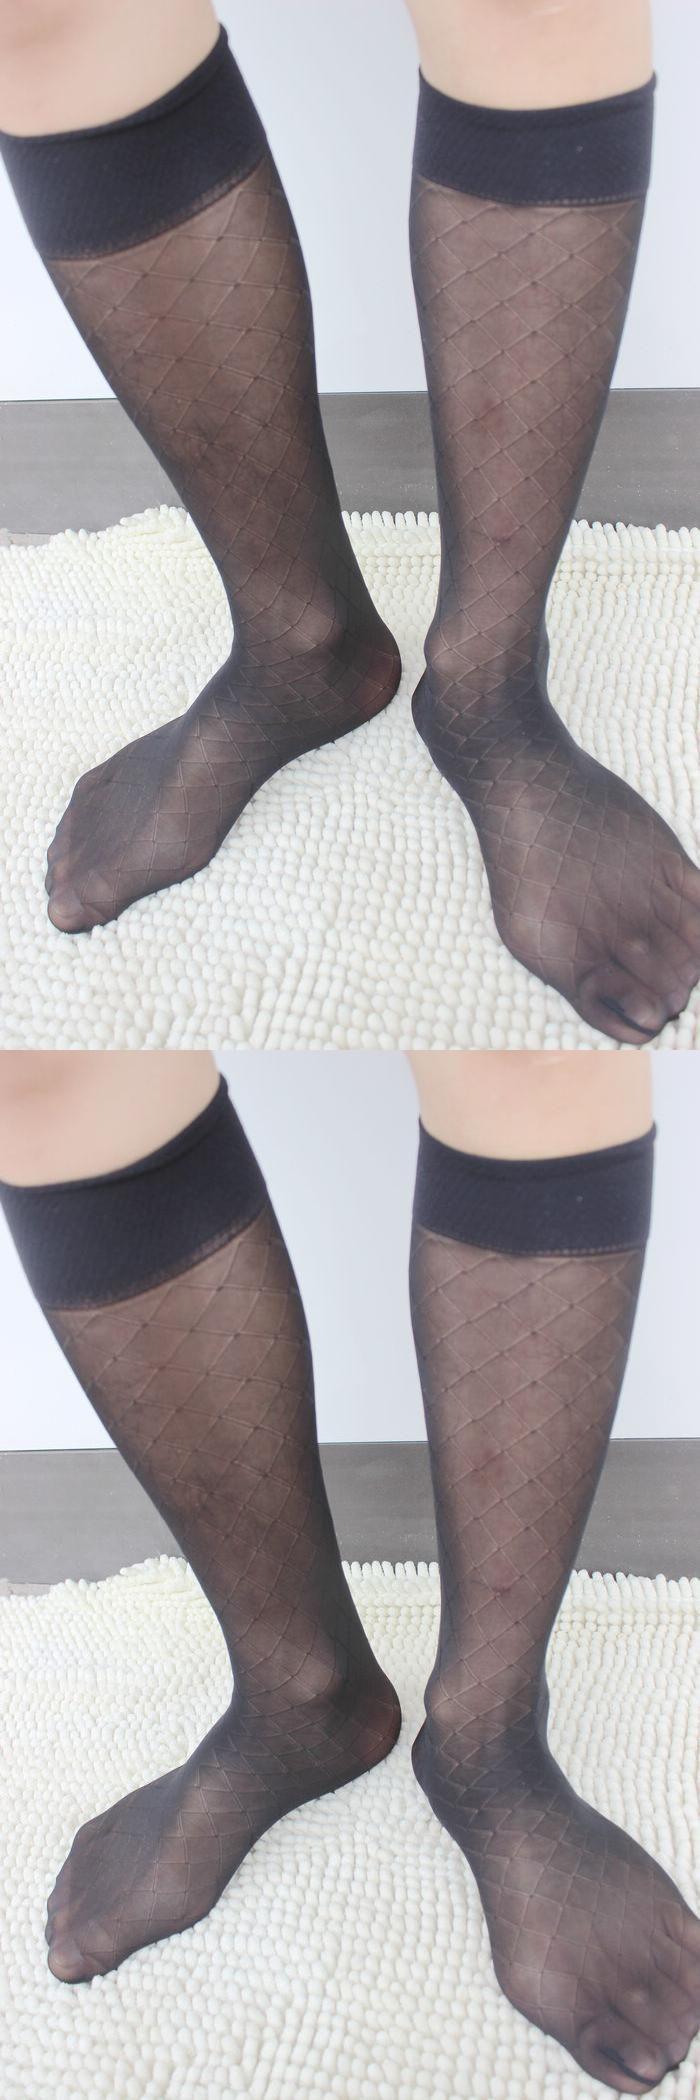 Gay Men Silks Socks Net Mesh Male formal suit dress Hose for leather shoes Sexy Breathable mesh male socks